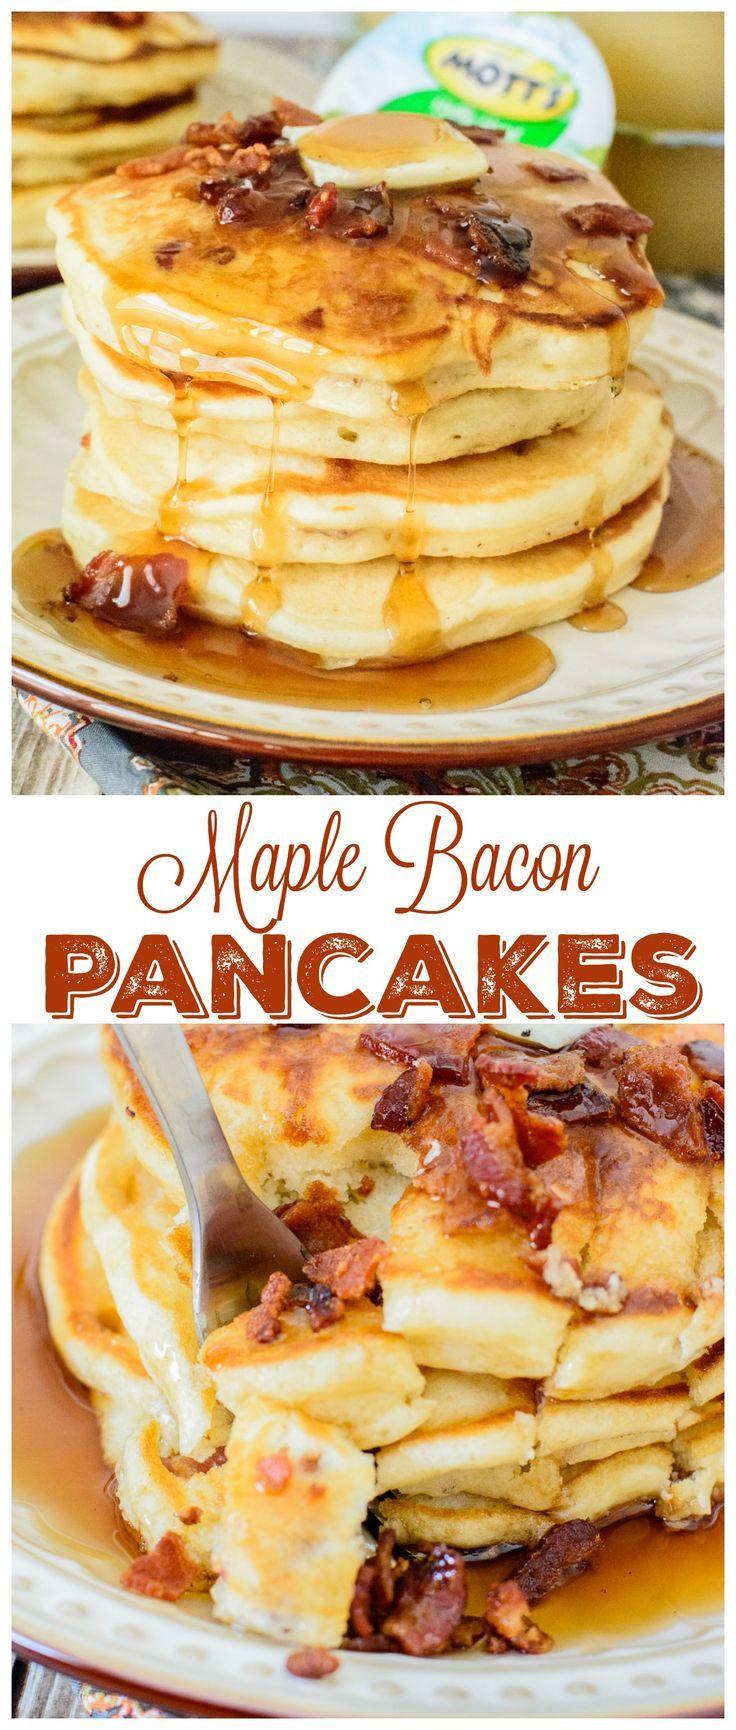 Matty Matheson Pancakes  78 ideas about Fluffy Pancakes on Pinterest